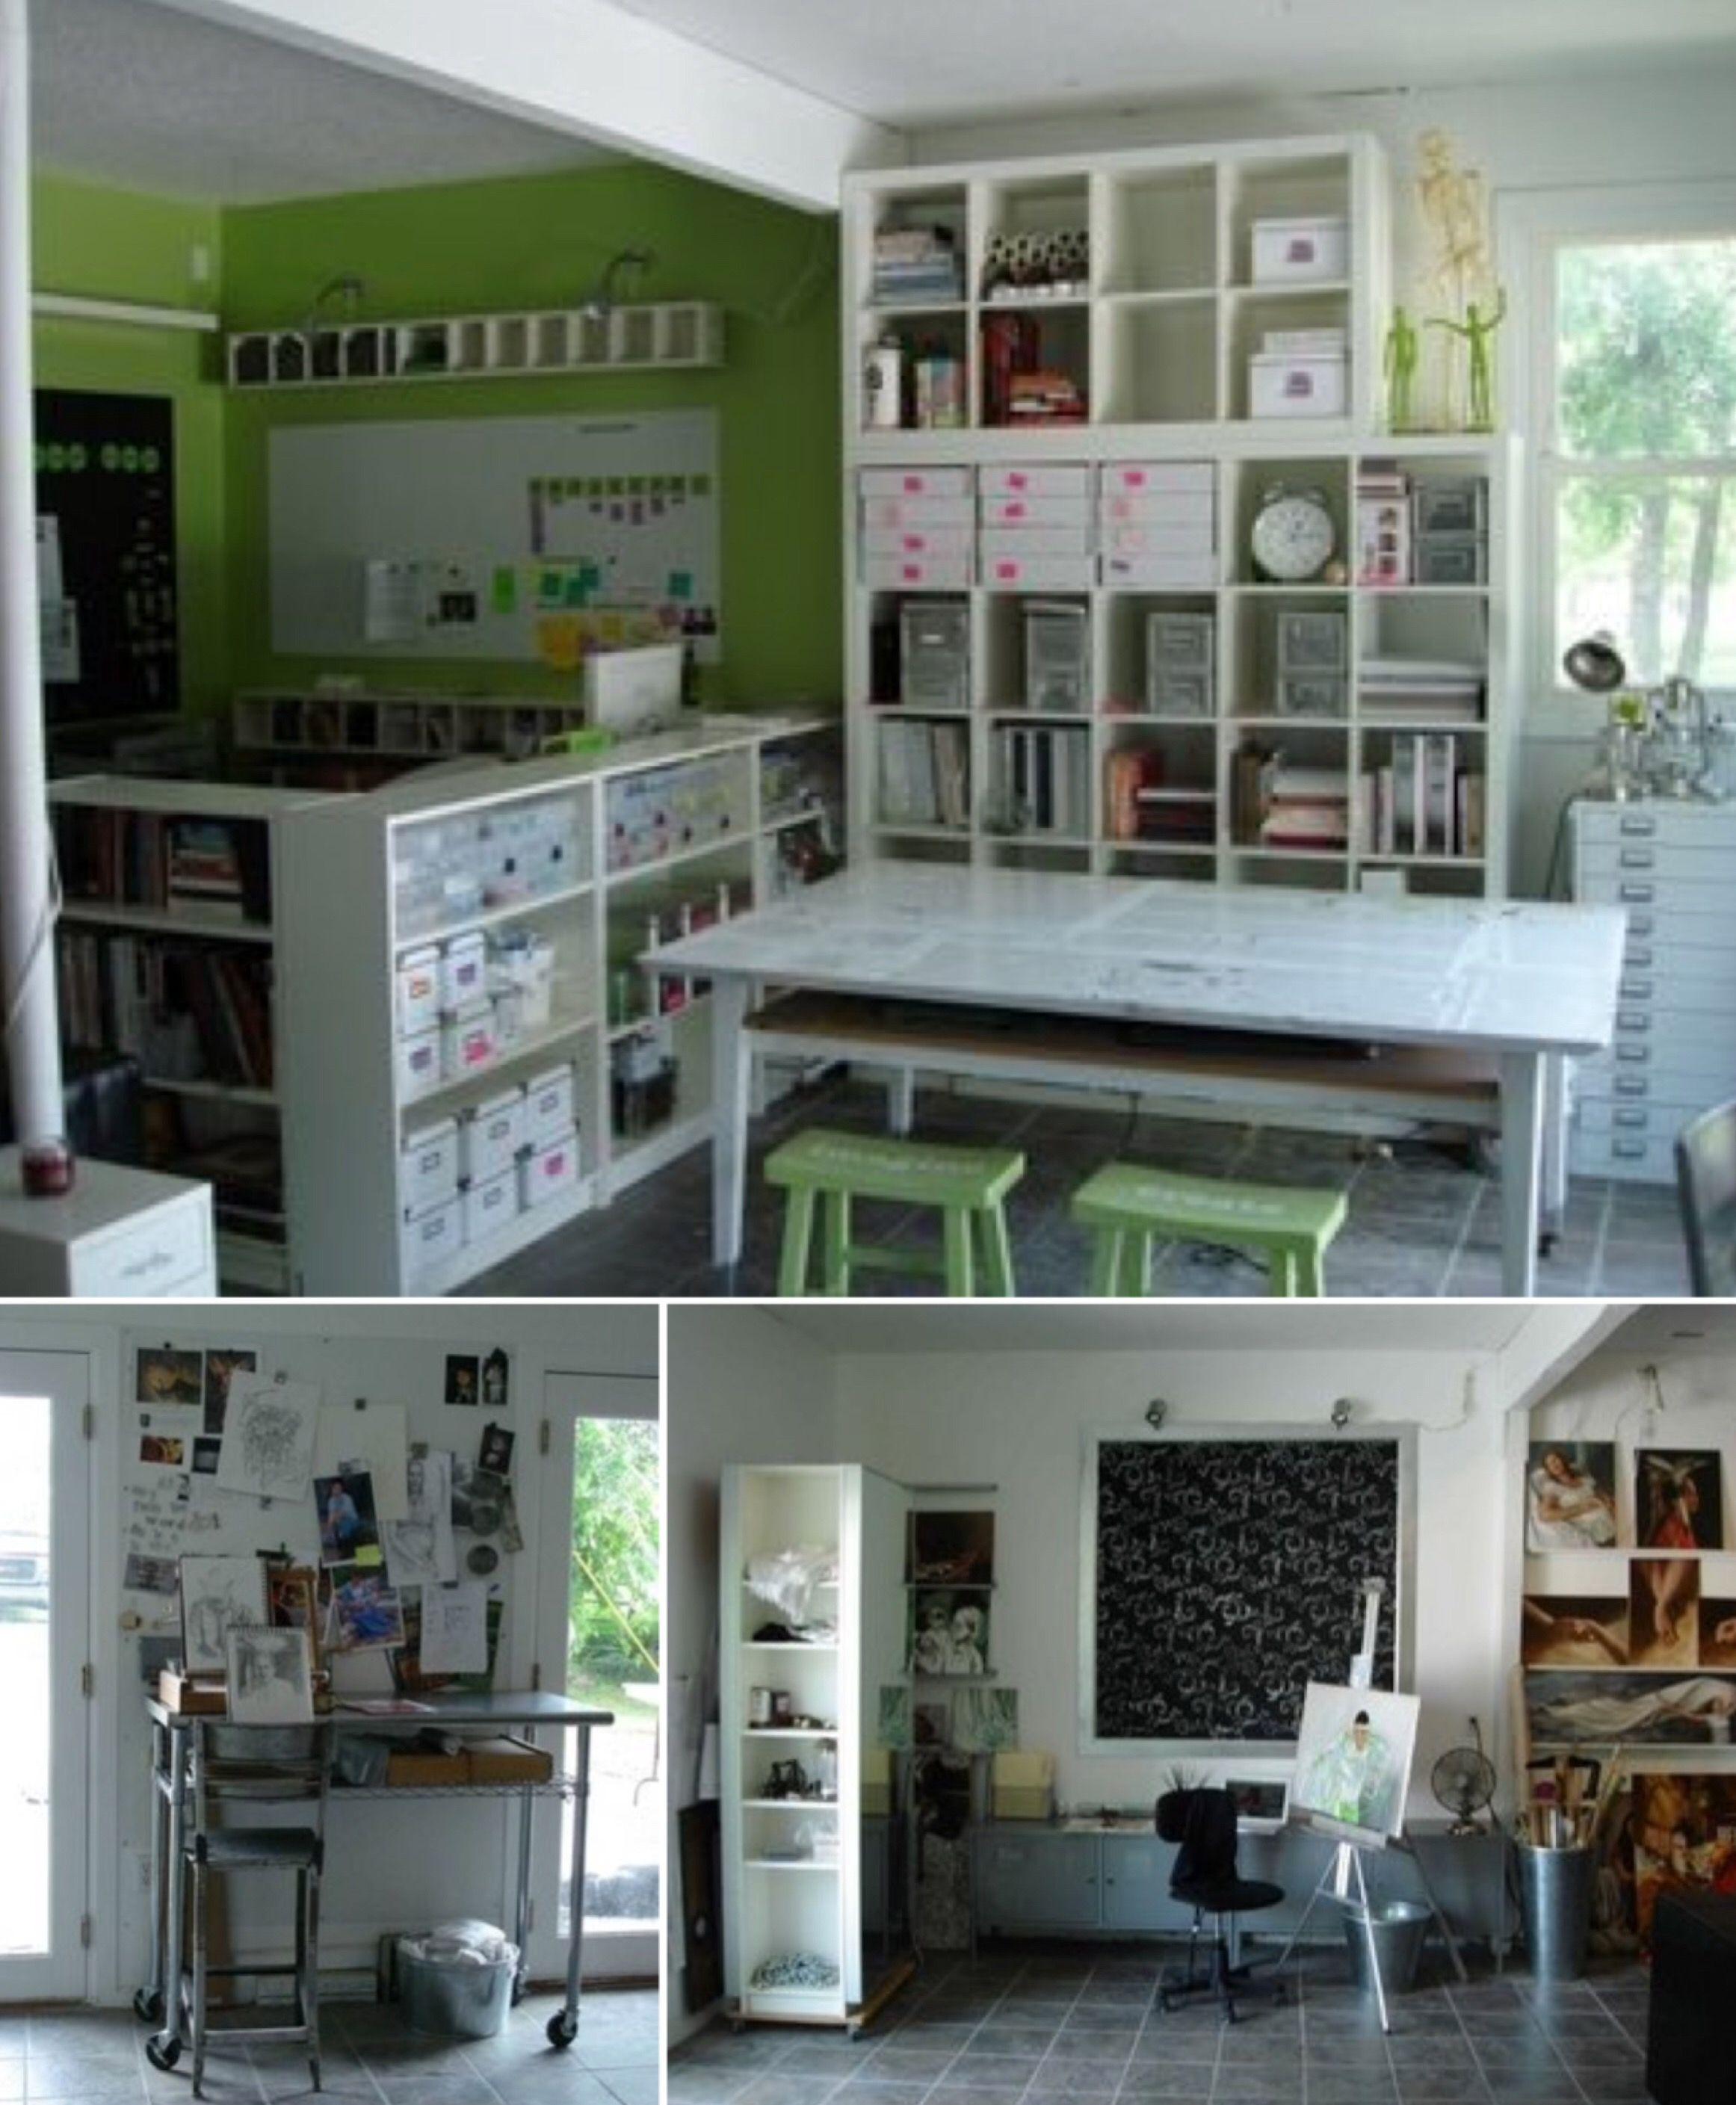 2stall garage tuned into art studio art studio stall